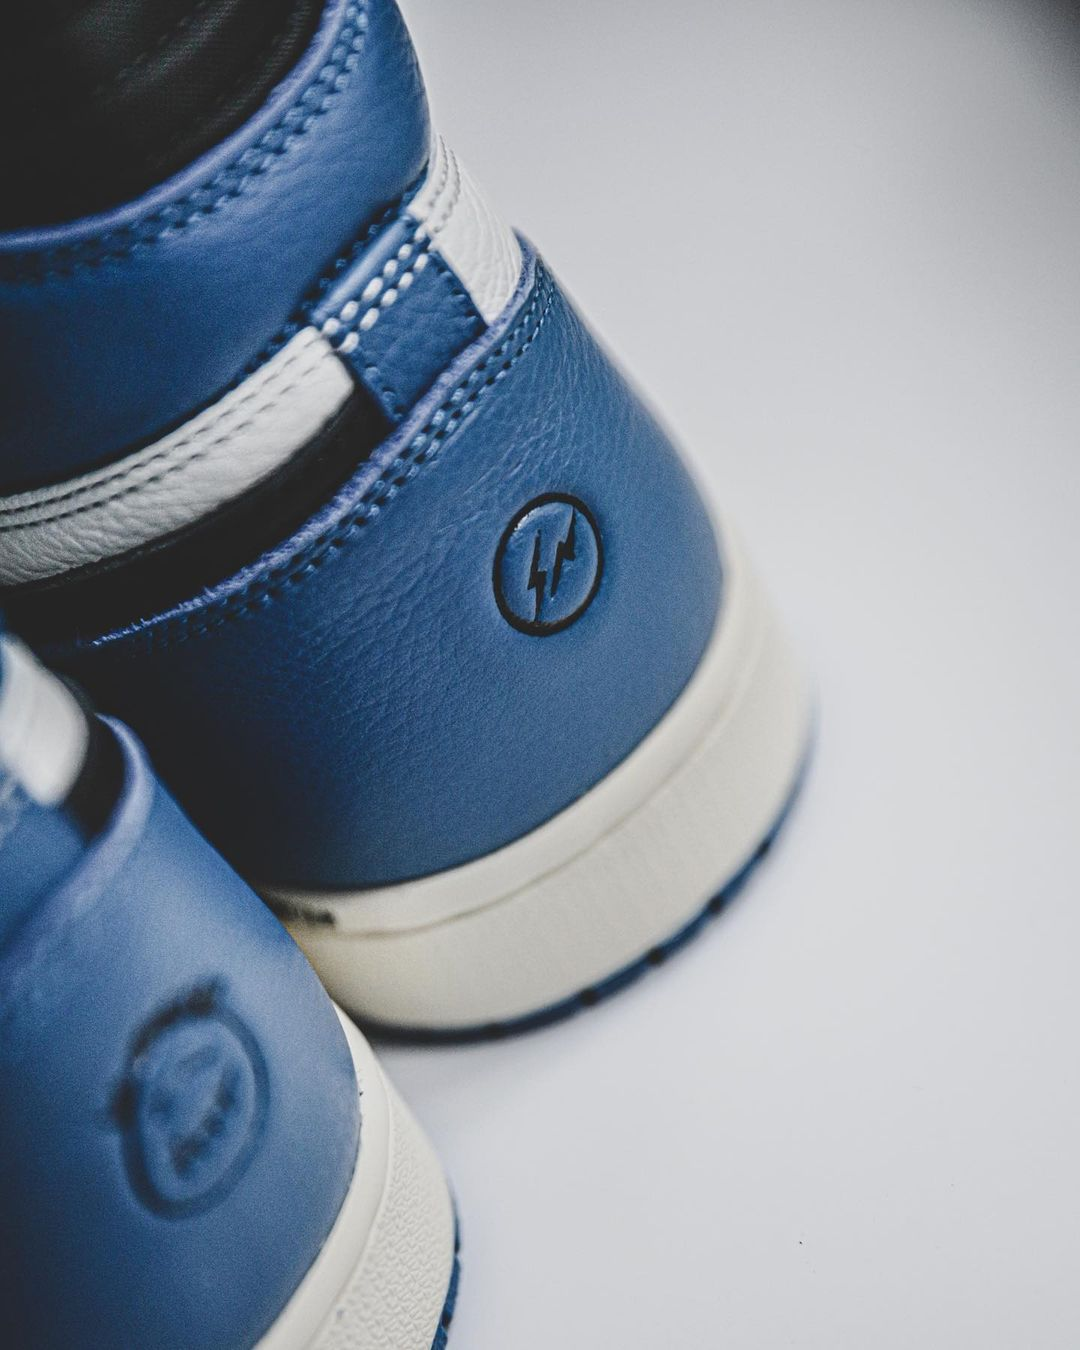 Nike,adidas,安踏,Yeezy,Travis Sc  耐克大战阿迪!八月 20 多双新鞋太猛!闪电倒钩 AJ1、Yeezy 大范围补货!